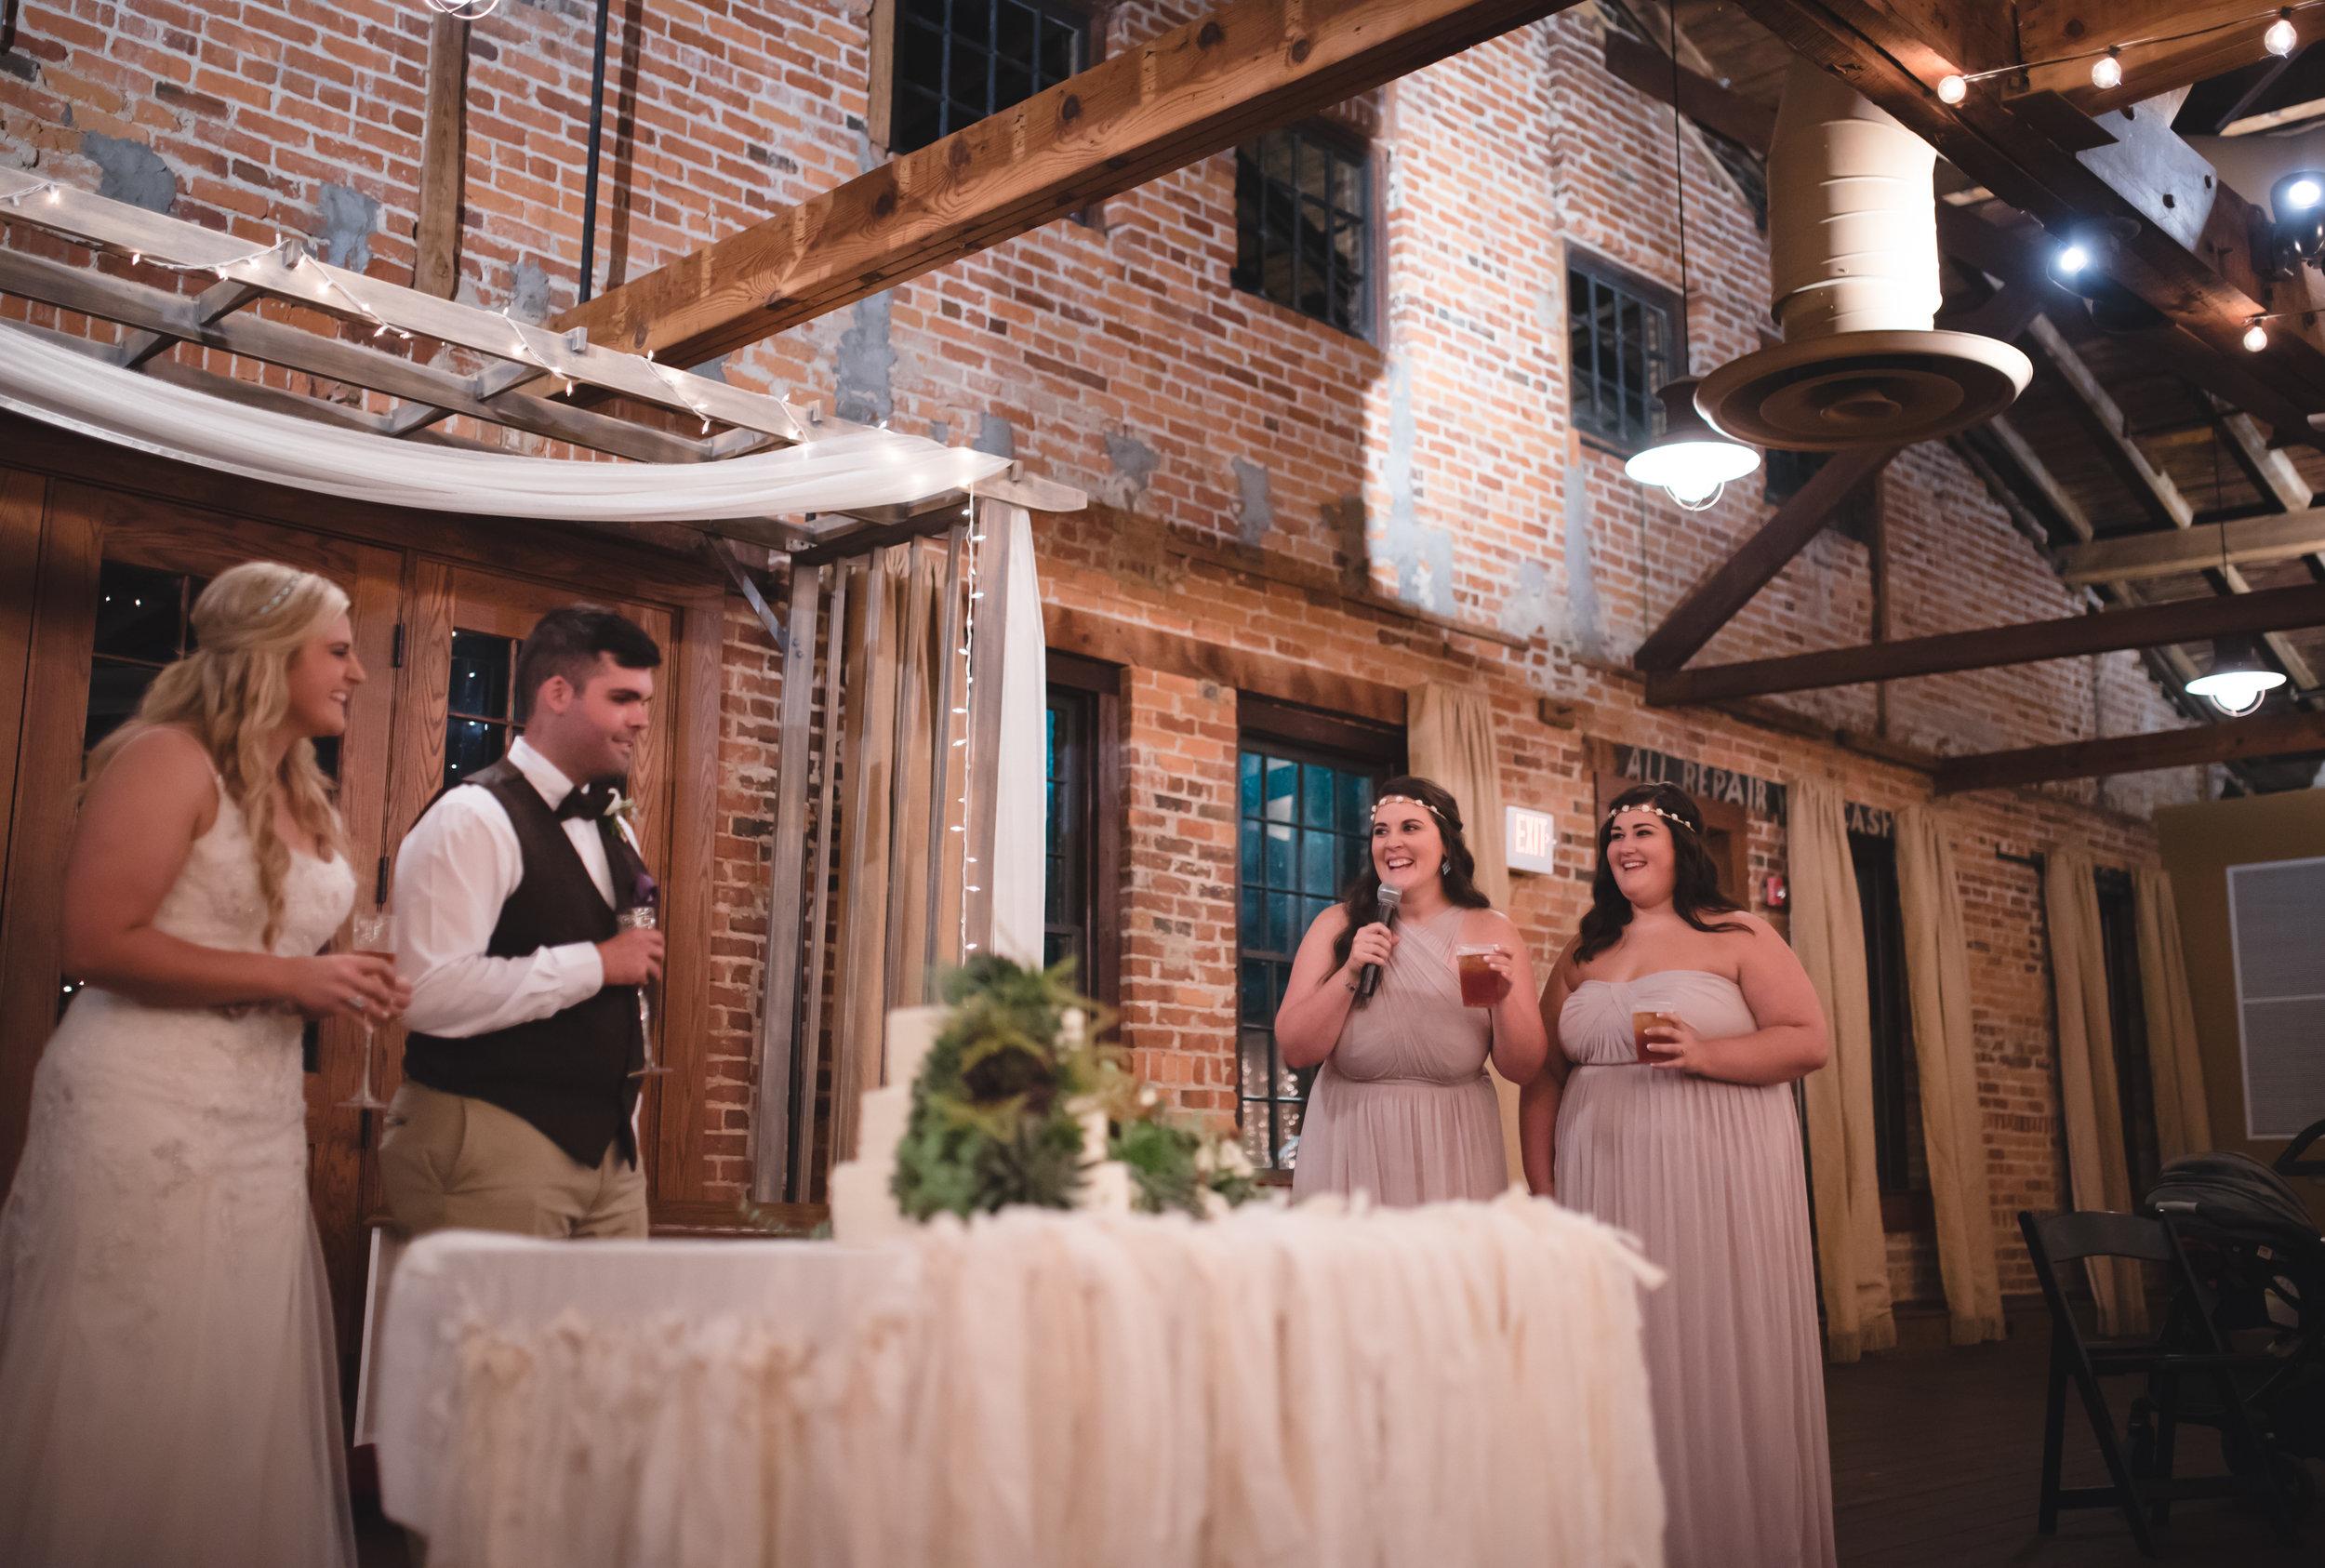 wedding-speech-pictures.jpg